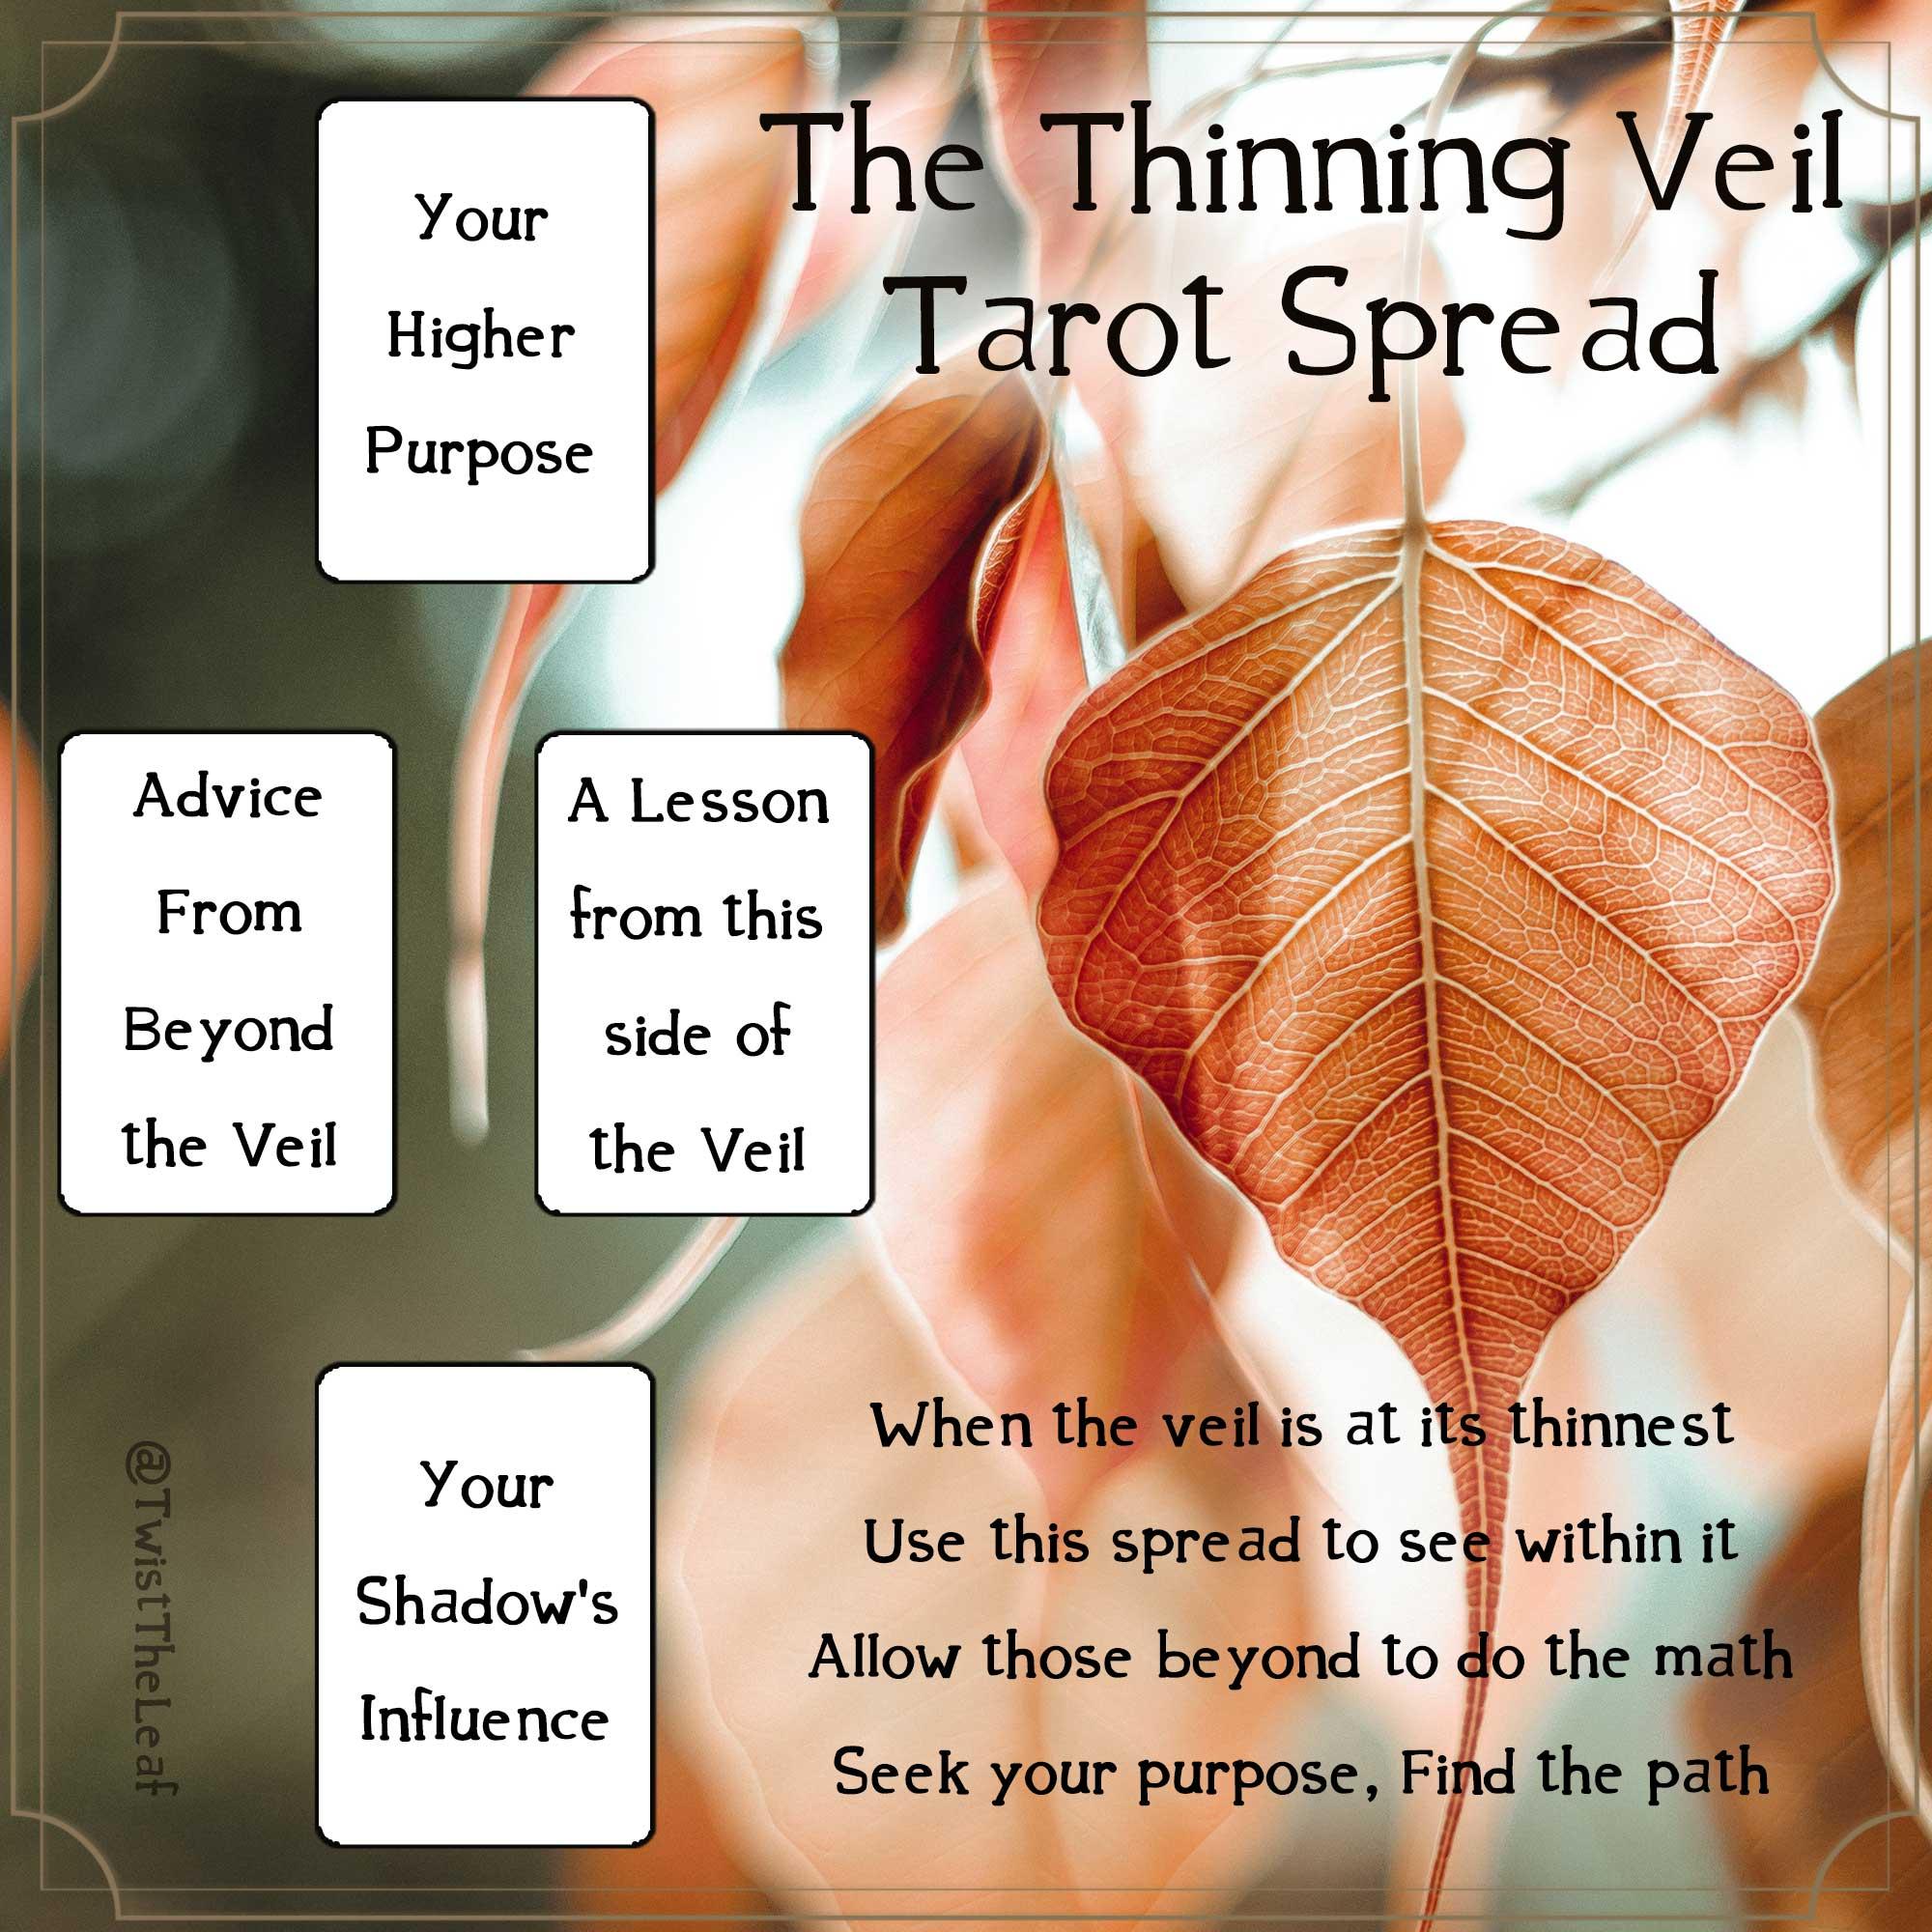 Thinning Veil Tarot Spread by TwisttheLeaf